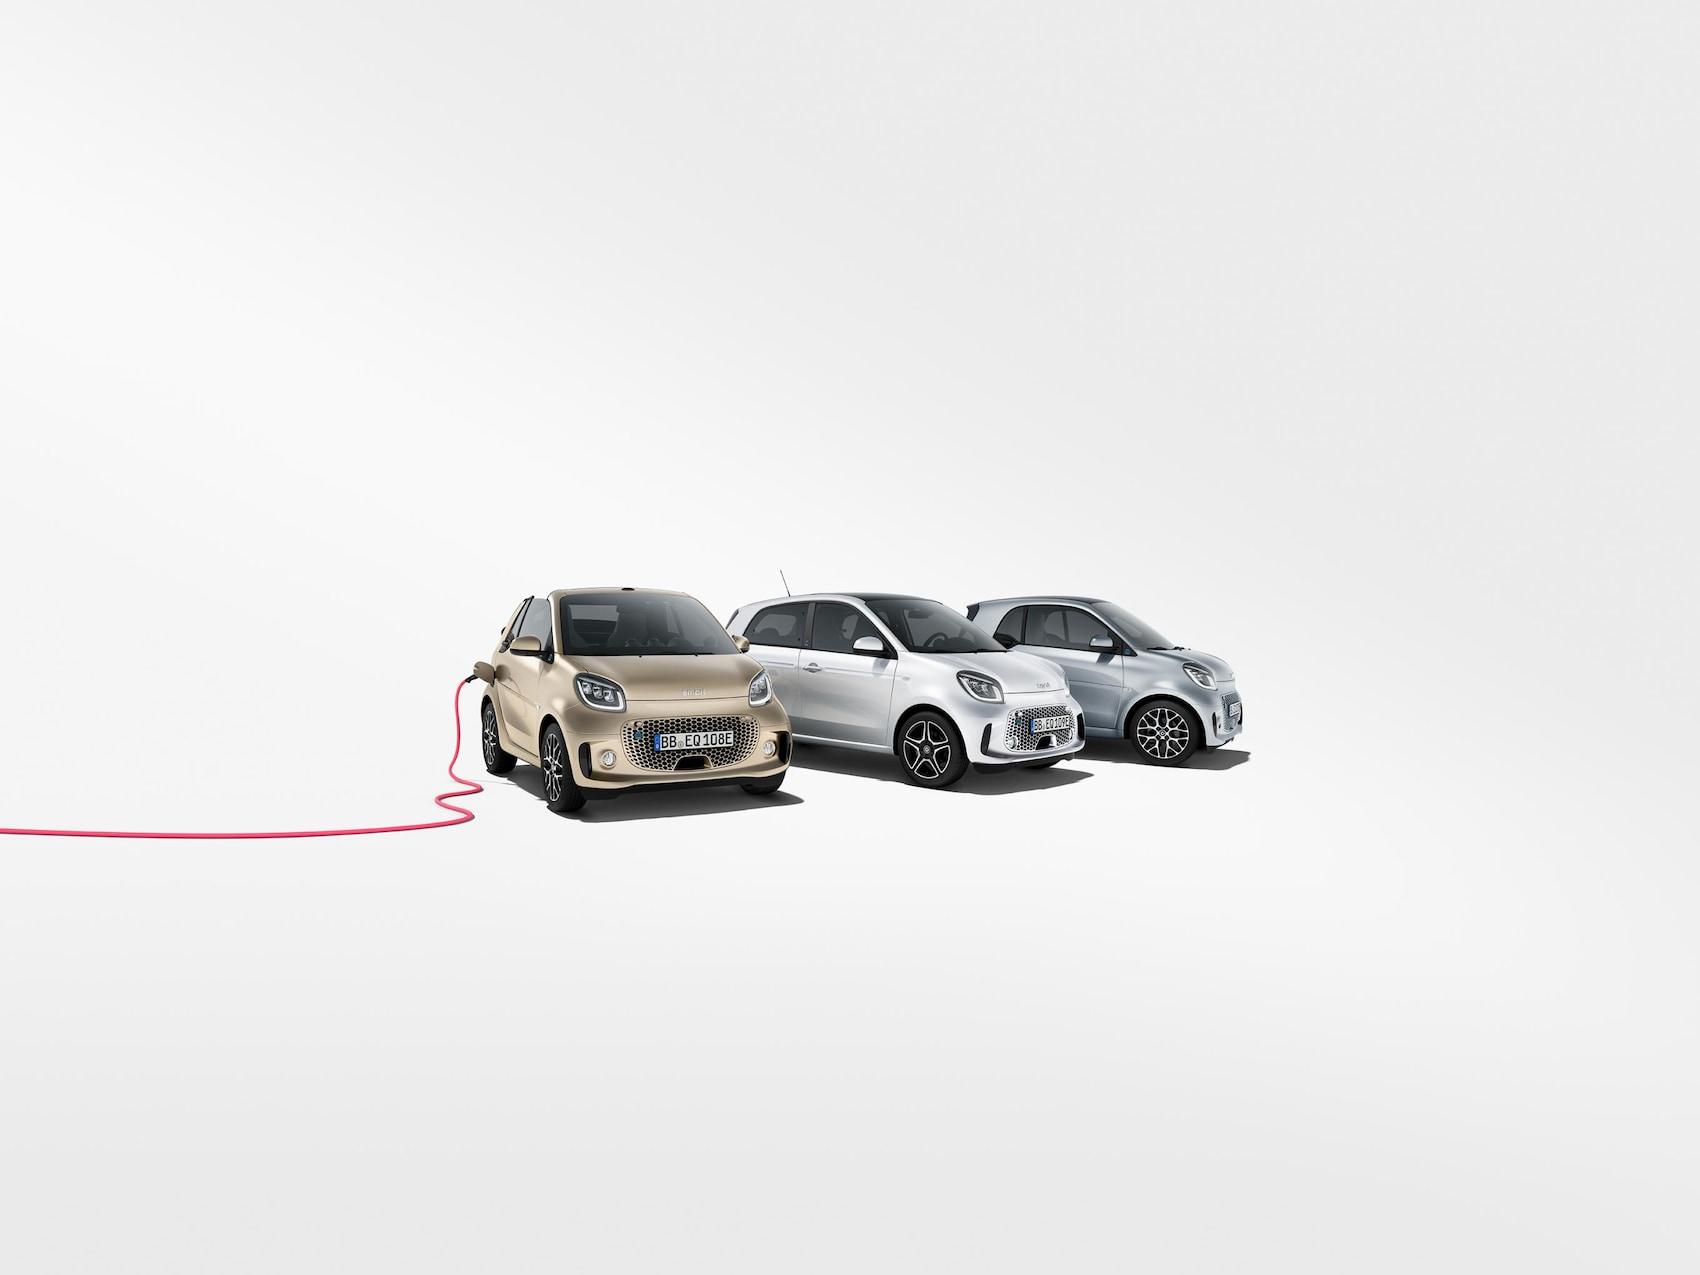 smart EQ forfour, smart EQ fortwo und smart EQ fortwo cabrio mit rotem Ladekabel